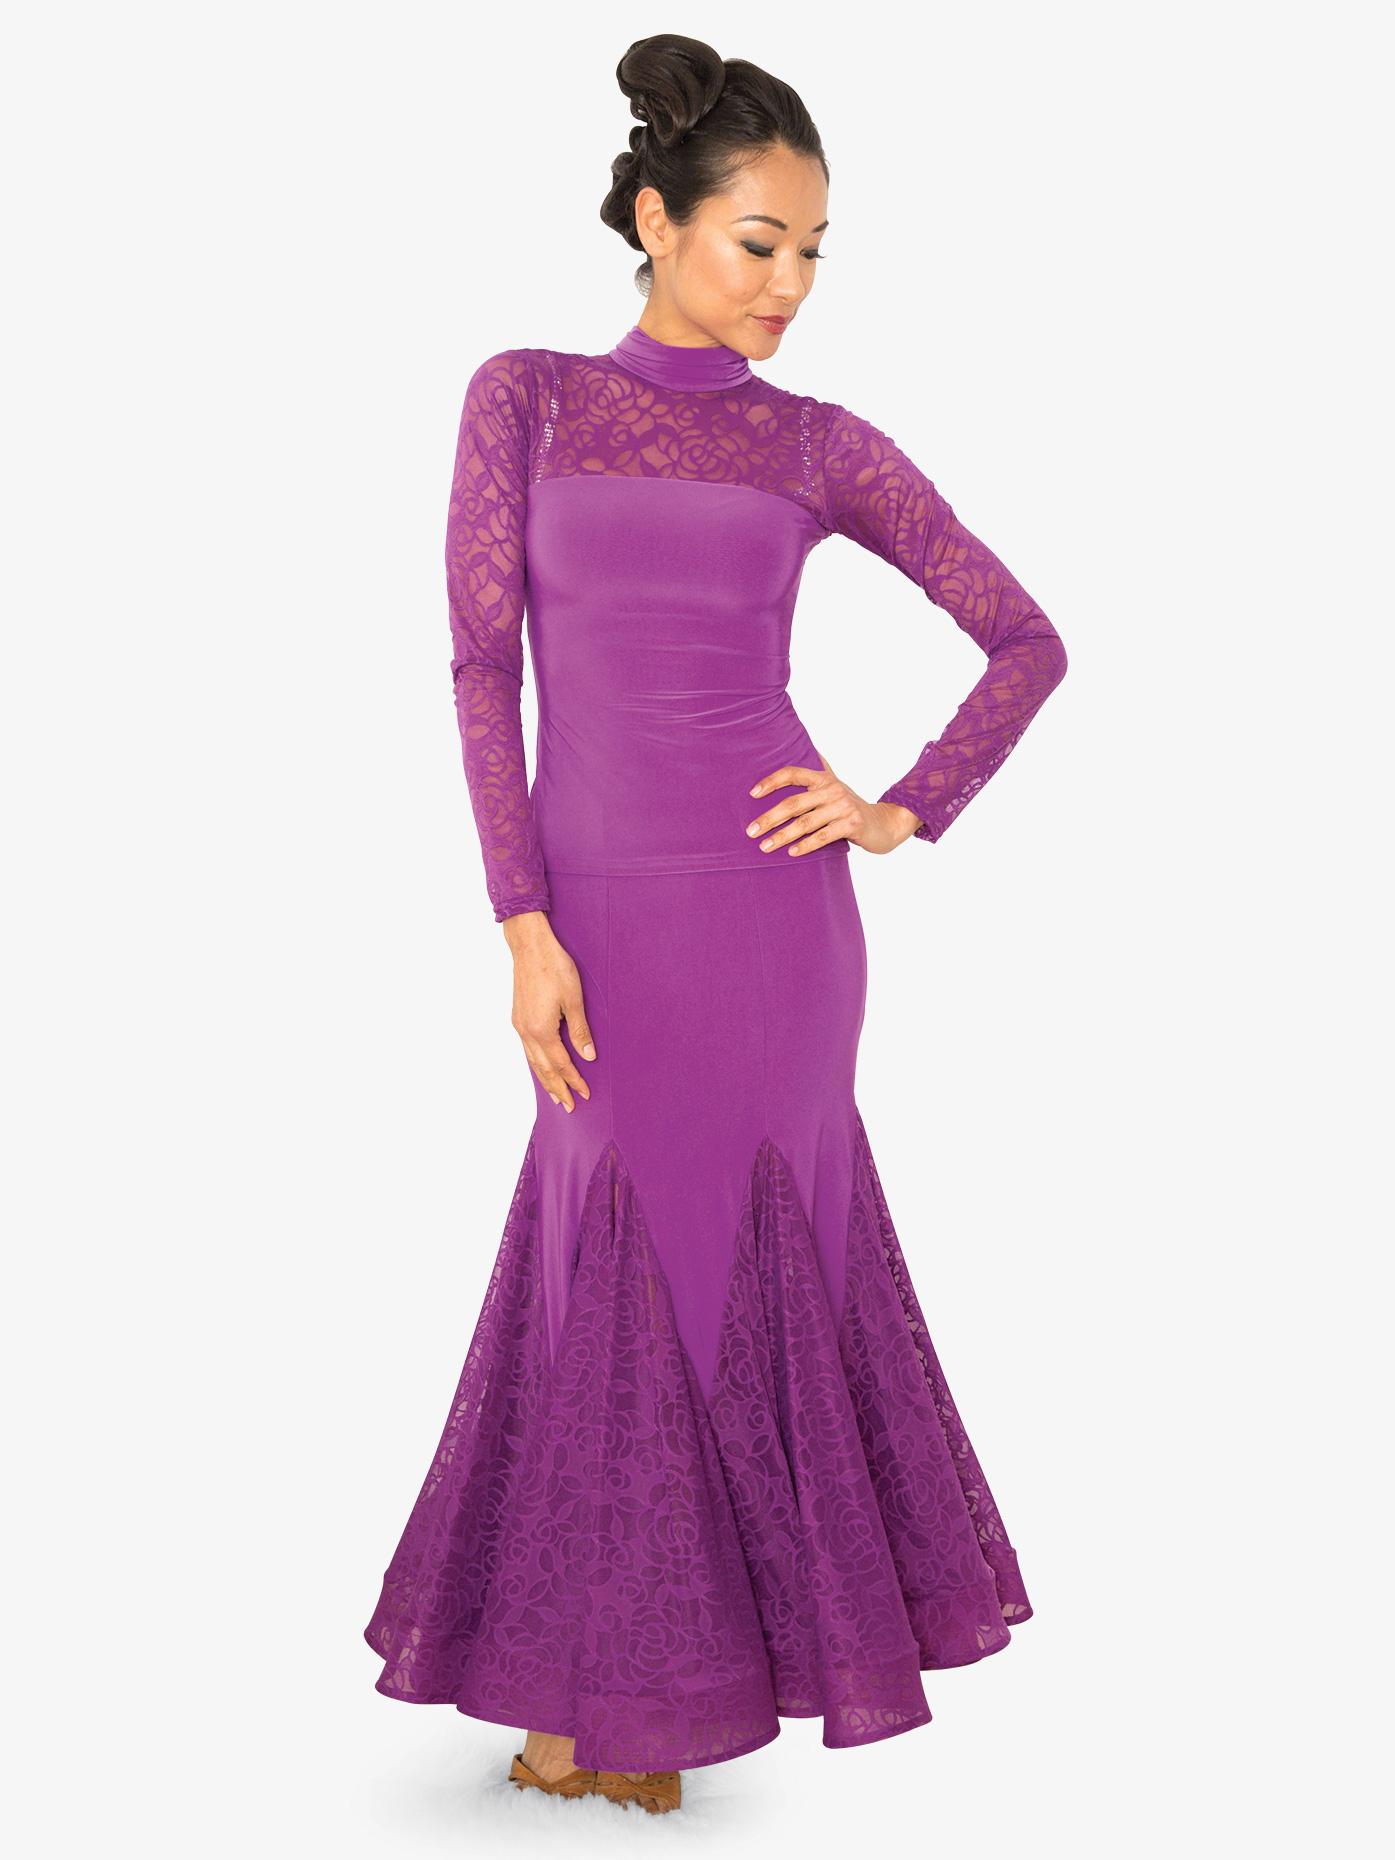 1b55645a6f4 Womens Long Lace Godet Ballroom Dance Skirt - Style No S807. Loading zoom